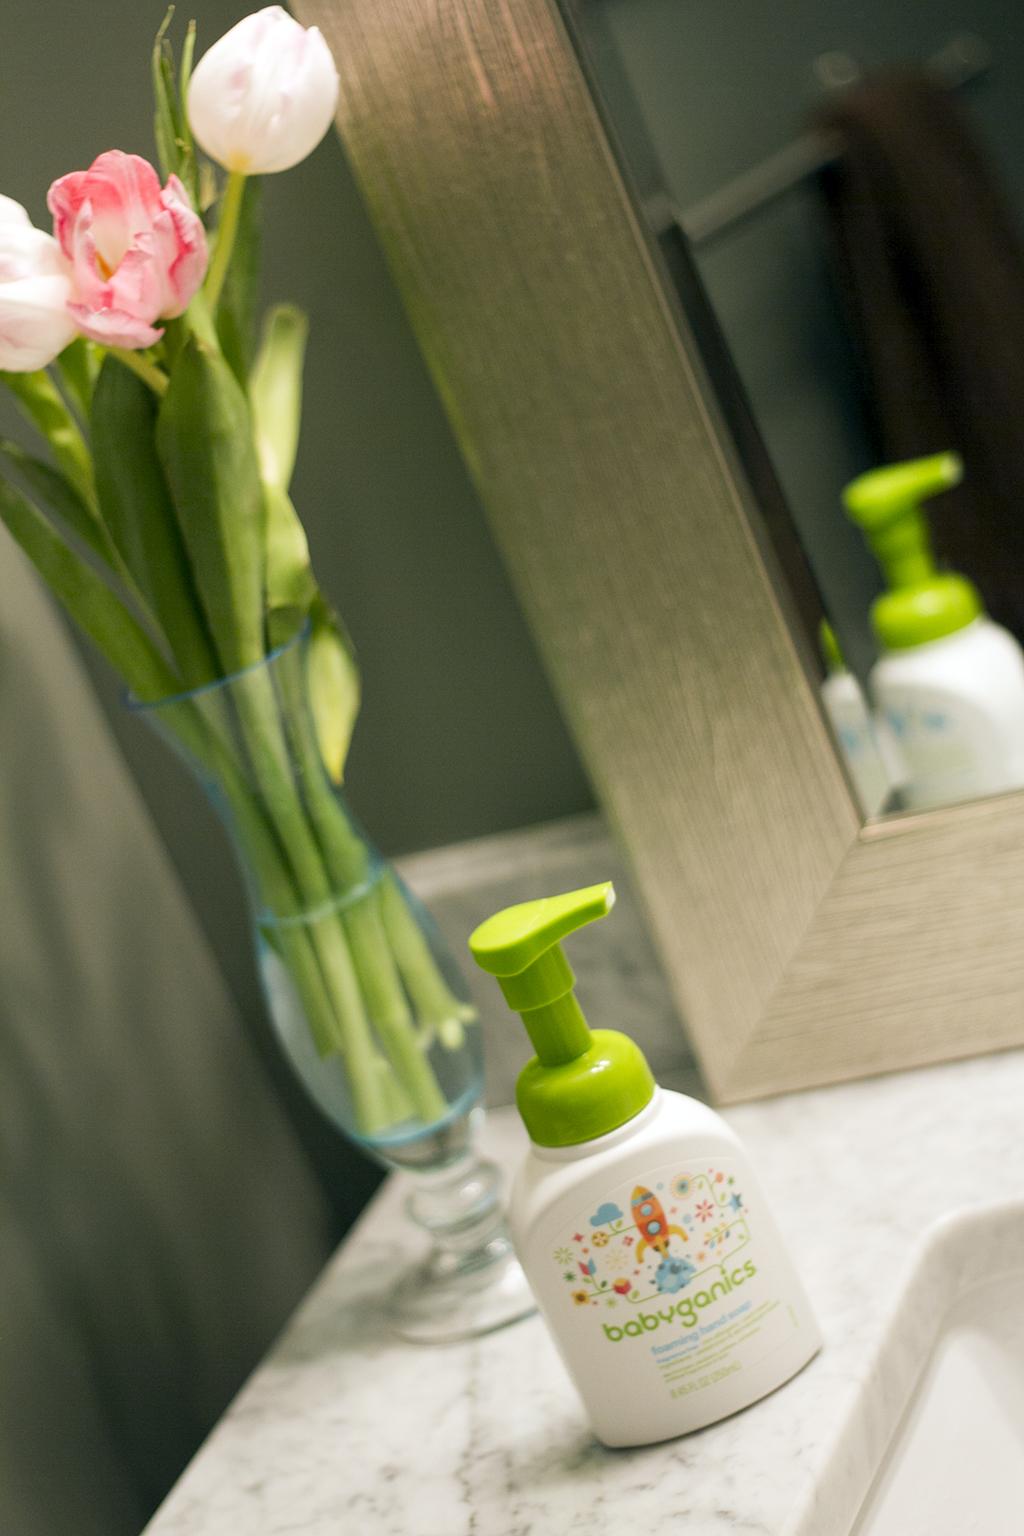 Babyganics Hand Soap